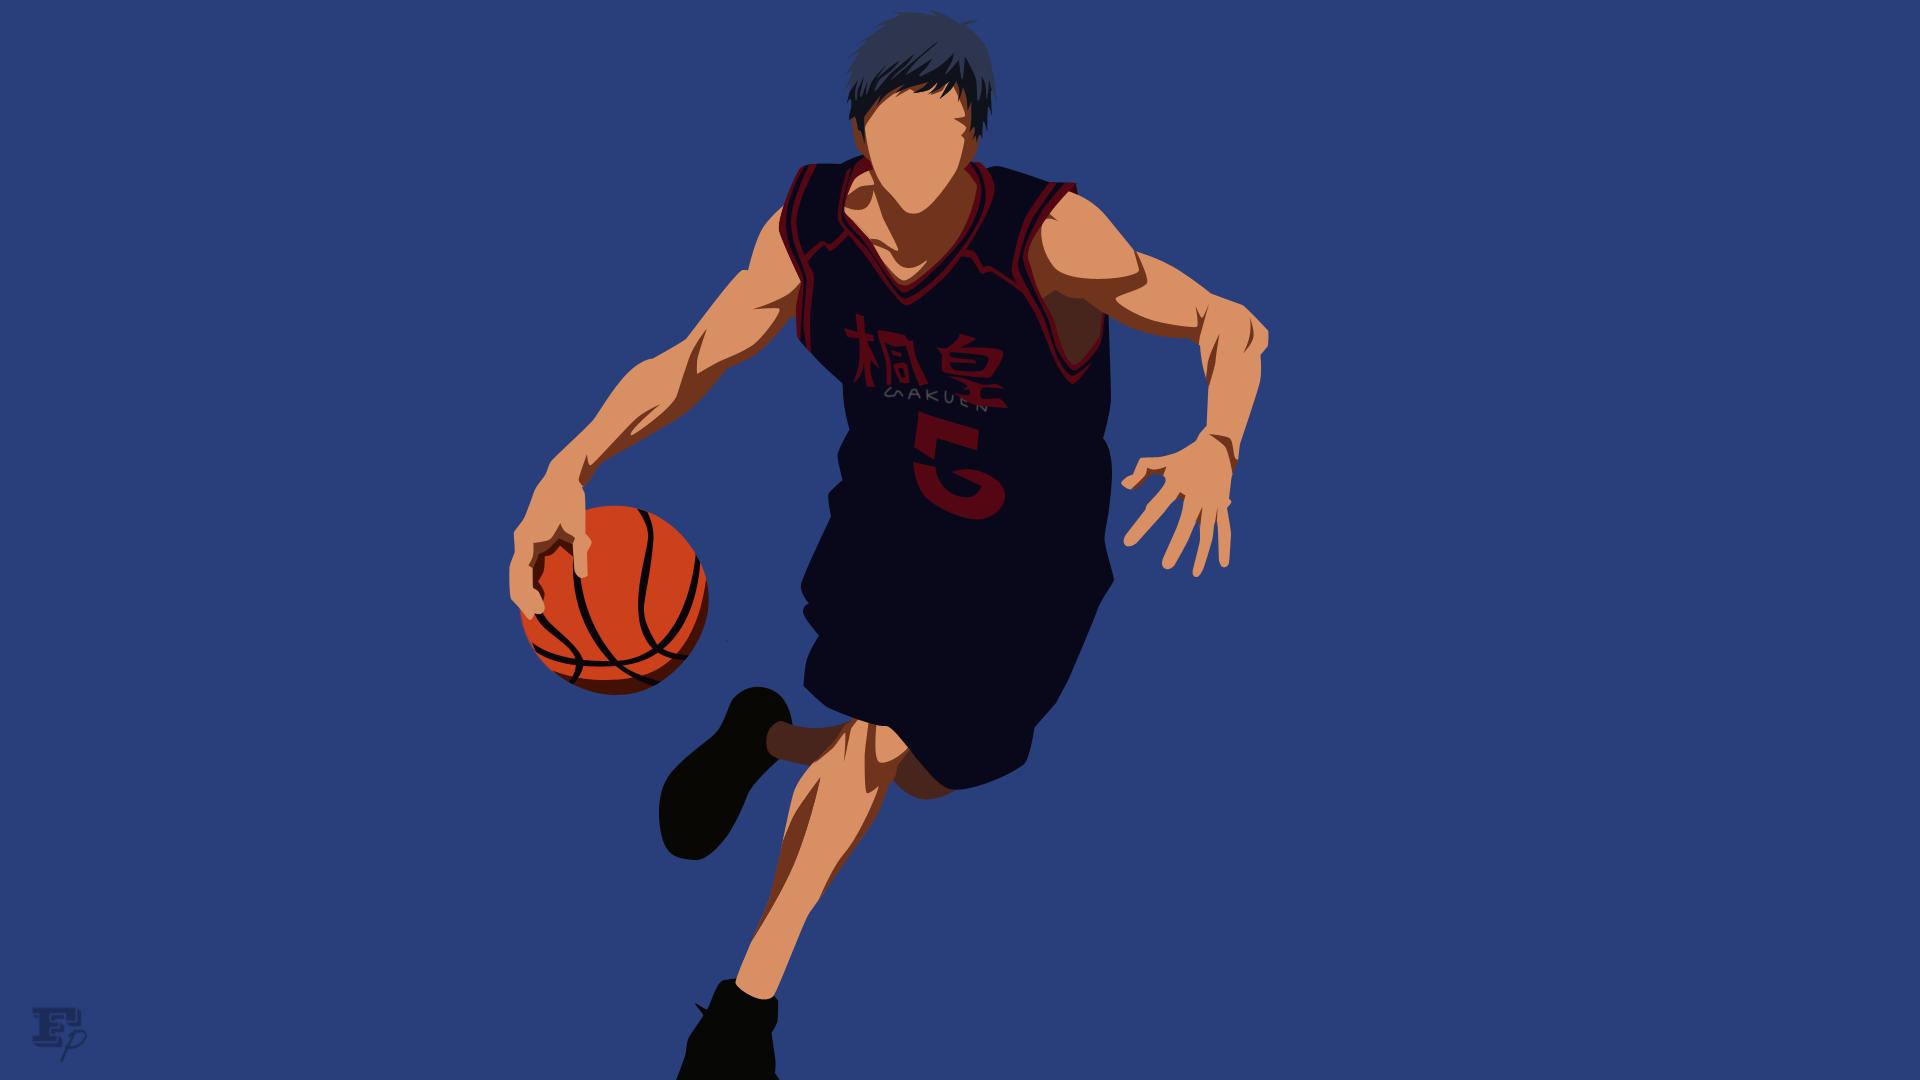 Aomine Wallpaper For Android fWg Kuroko no basket